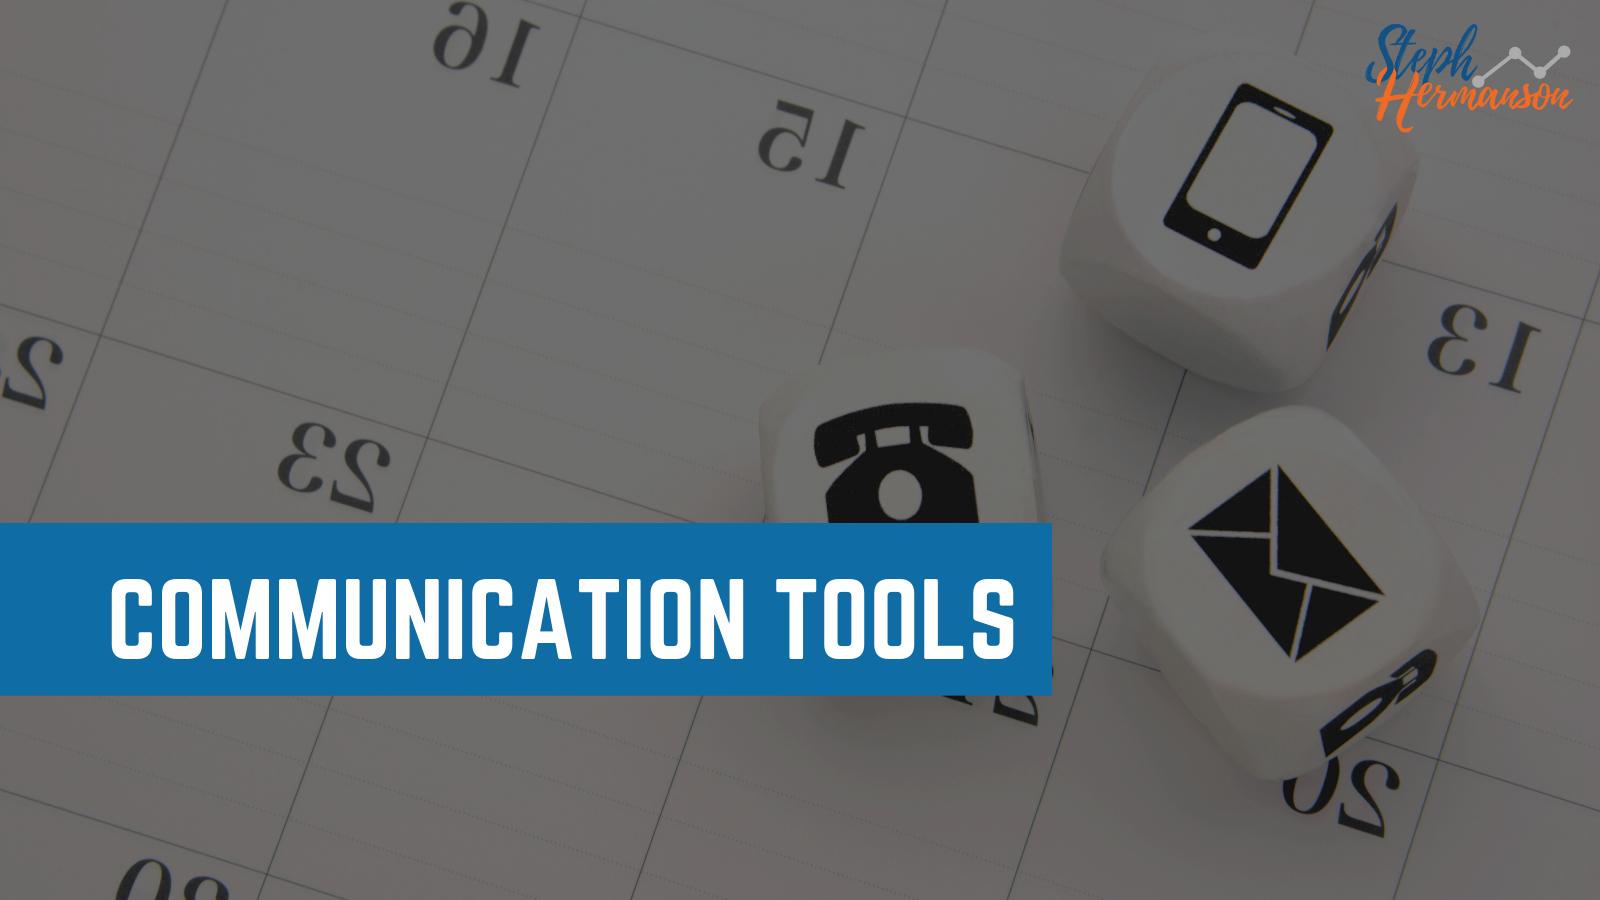 communication collaboration tools digital marketing teams 2021 steph hermanson